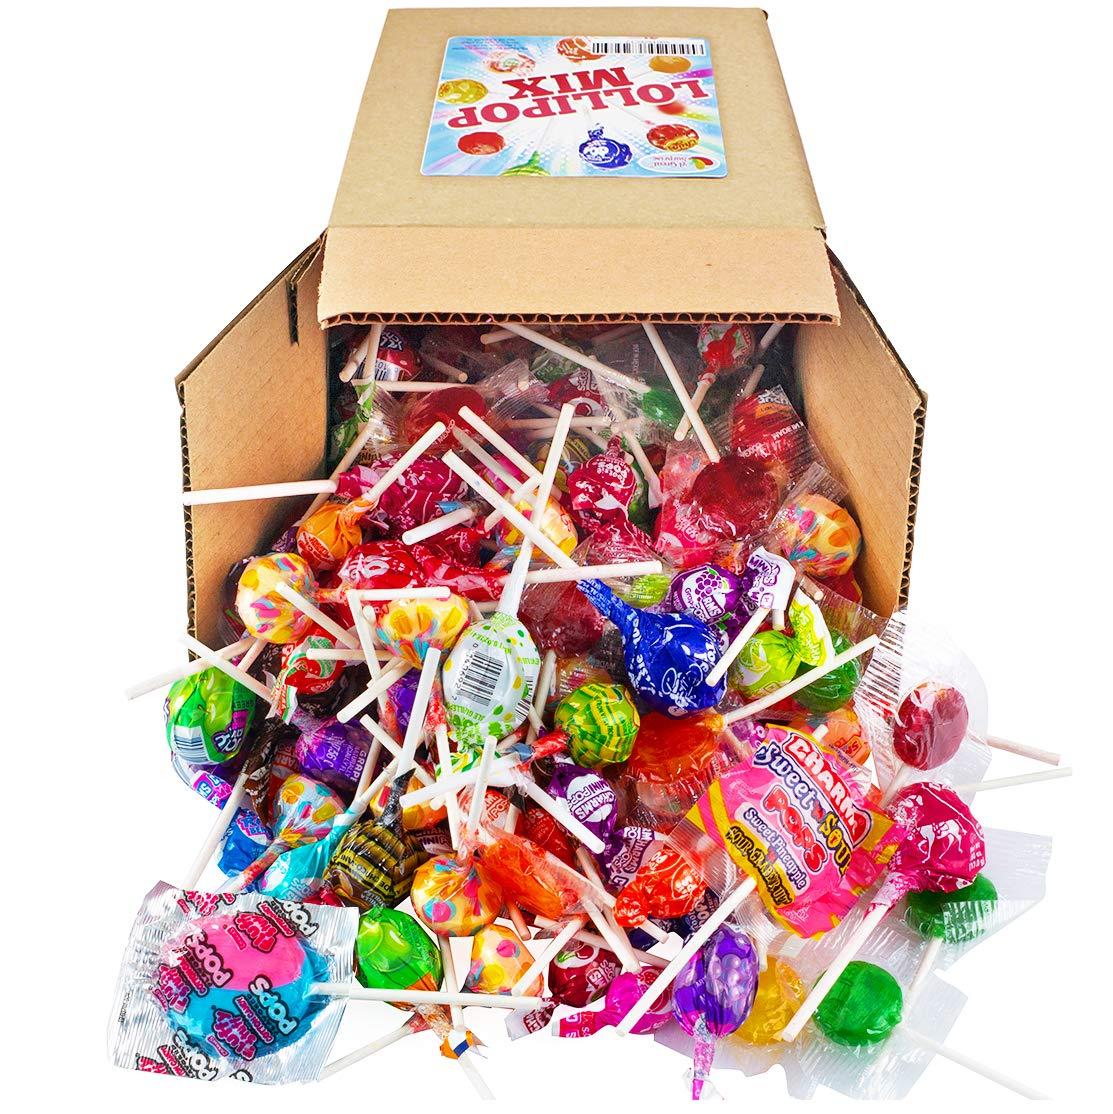 Lollipops - Lollipop Bulk – Lollipops for Kids – Lollipop Variety – Holiday Candy Bulk - Assorted Variety - Bulk Candy - 3.5 Pounds